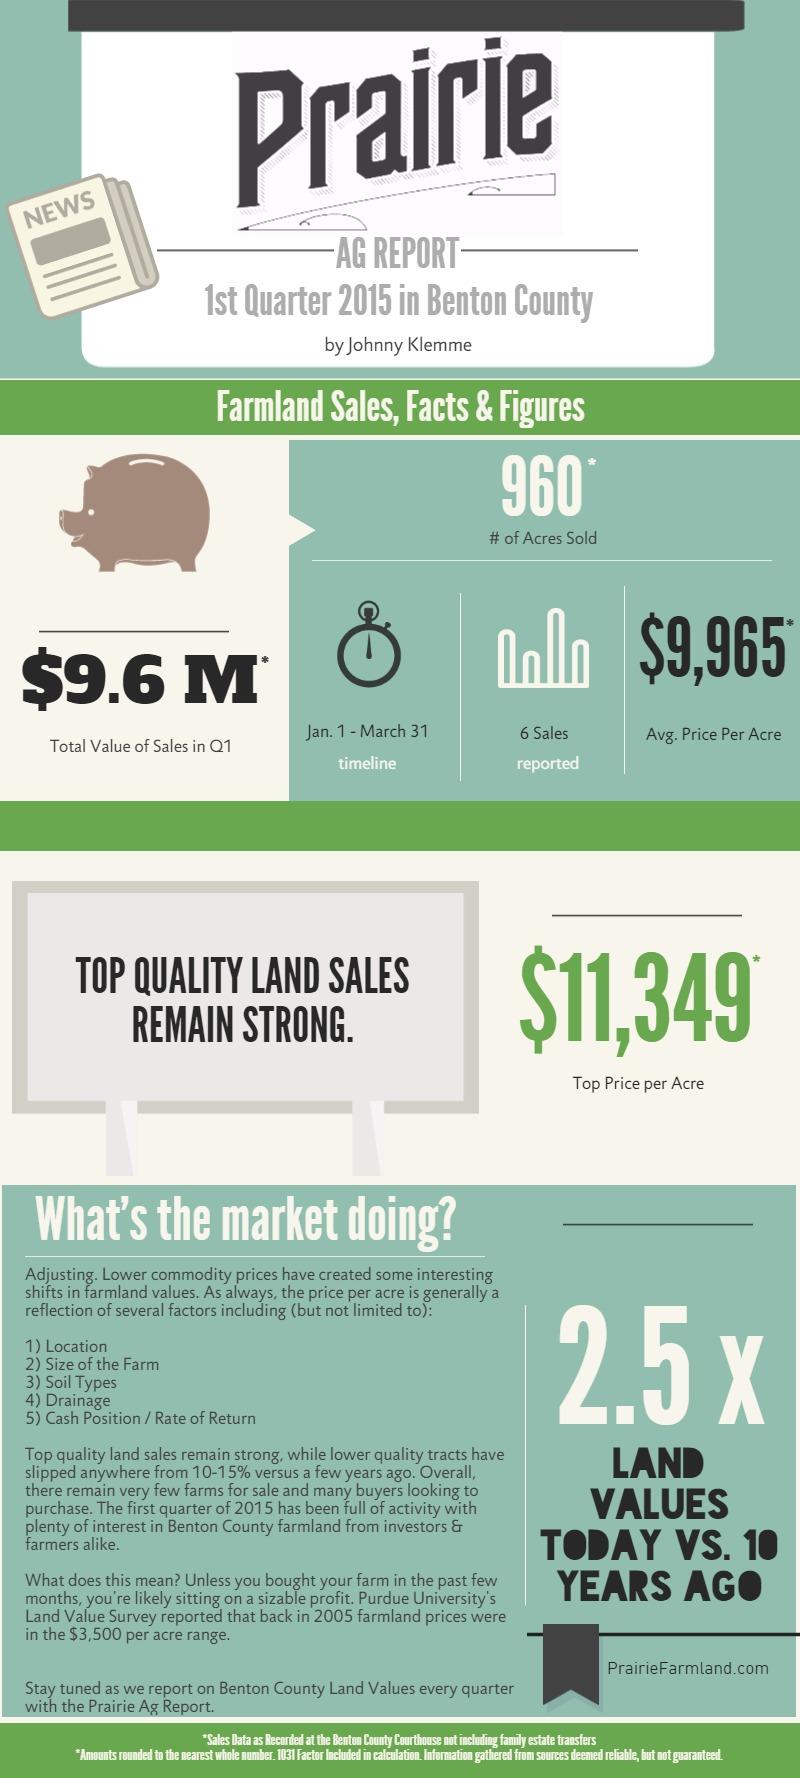 Q1 2015 Benton County Farm Sales Indiana Farmland Sales in Q1 of 2015 Real Esate Trend Report